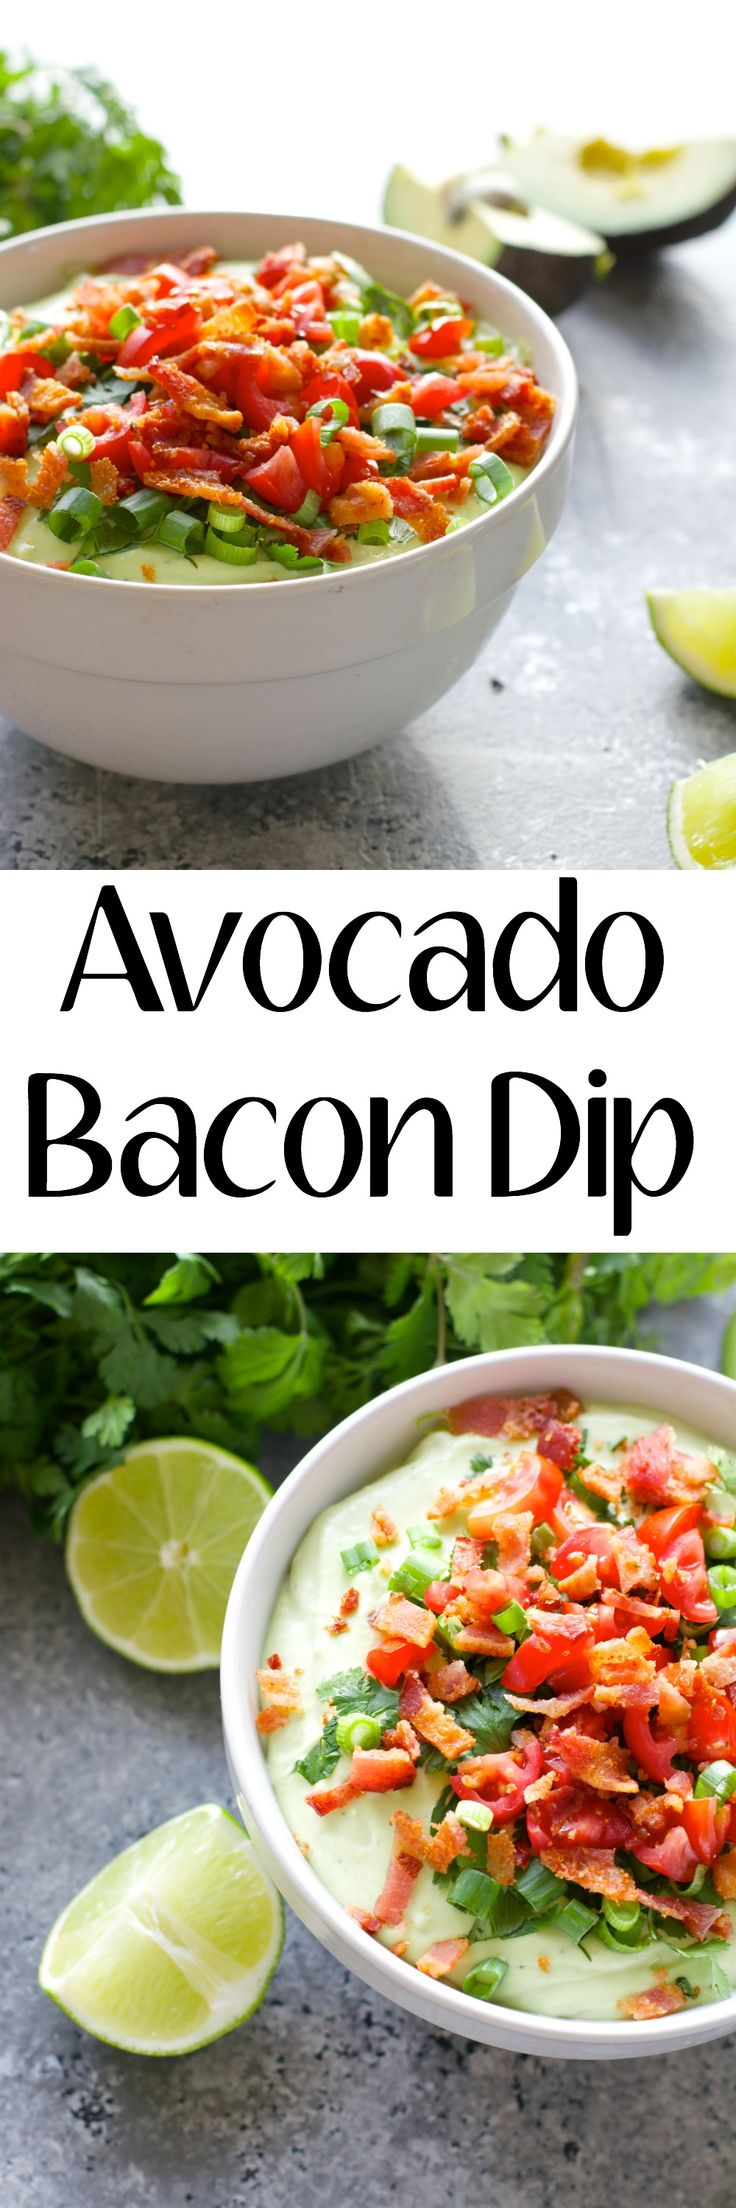 Creamy Avocado, light sour cream, spices and crisp bacon make for the ...